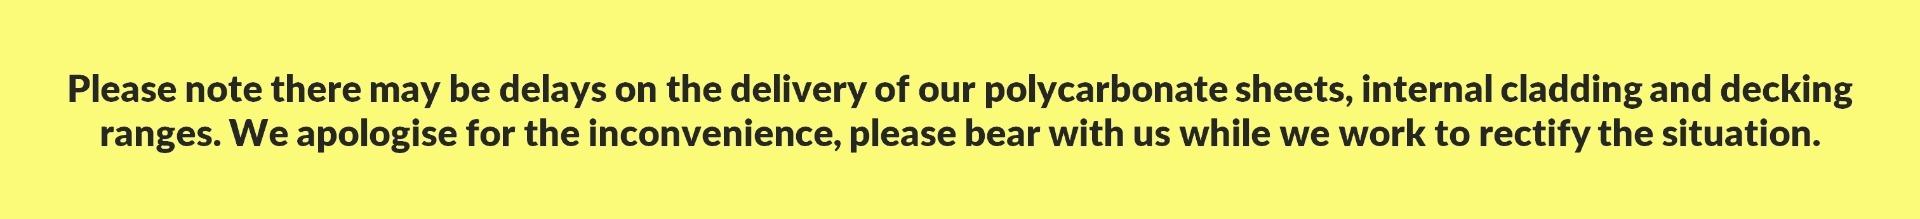 Potential Delays Warning Banner